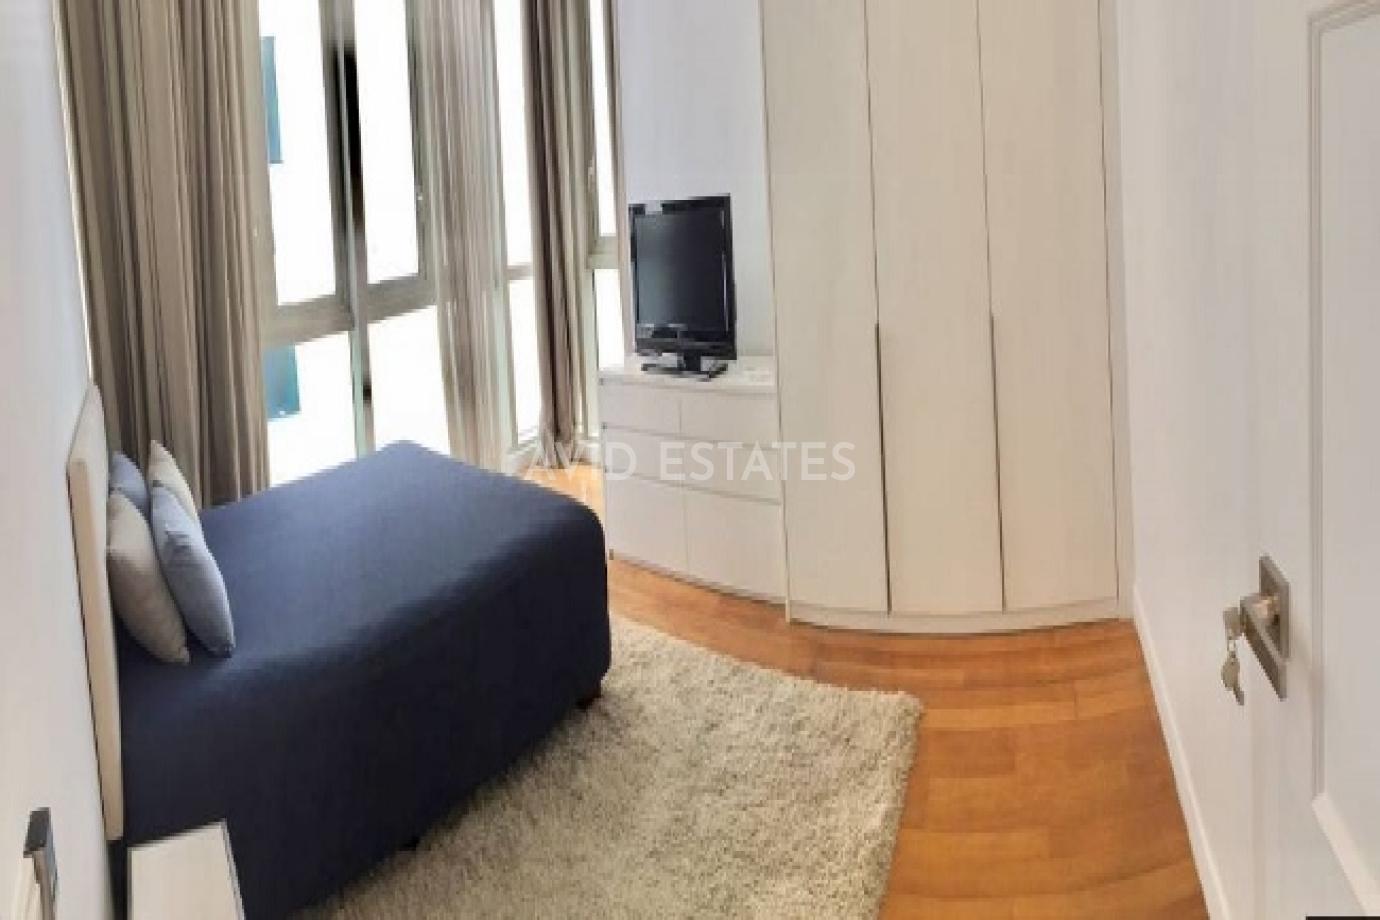 Marc Residence, KLCC,Kuala Lumpur, 3 Bedrooms Bedrooms, ,3 BathroomsBathrooms,Condominium / Serviced Residence,To Let,Marc Residence,Marc Residence,1441